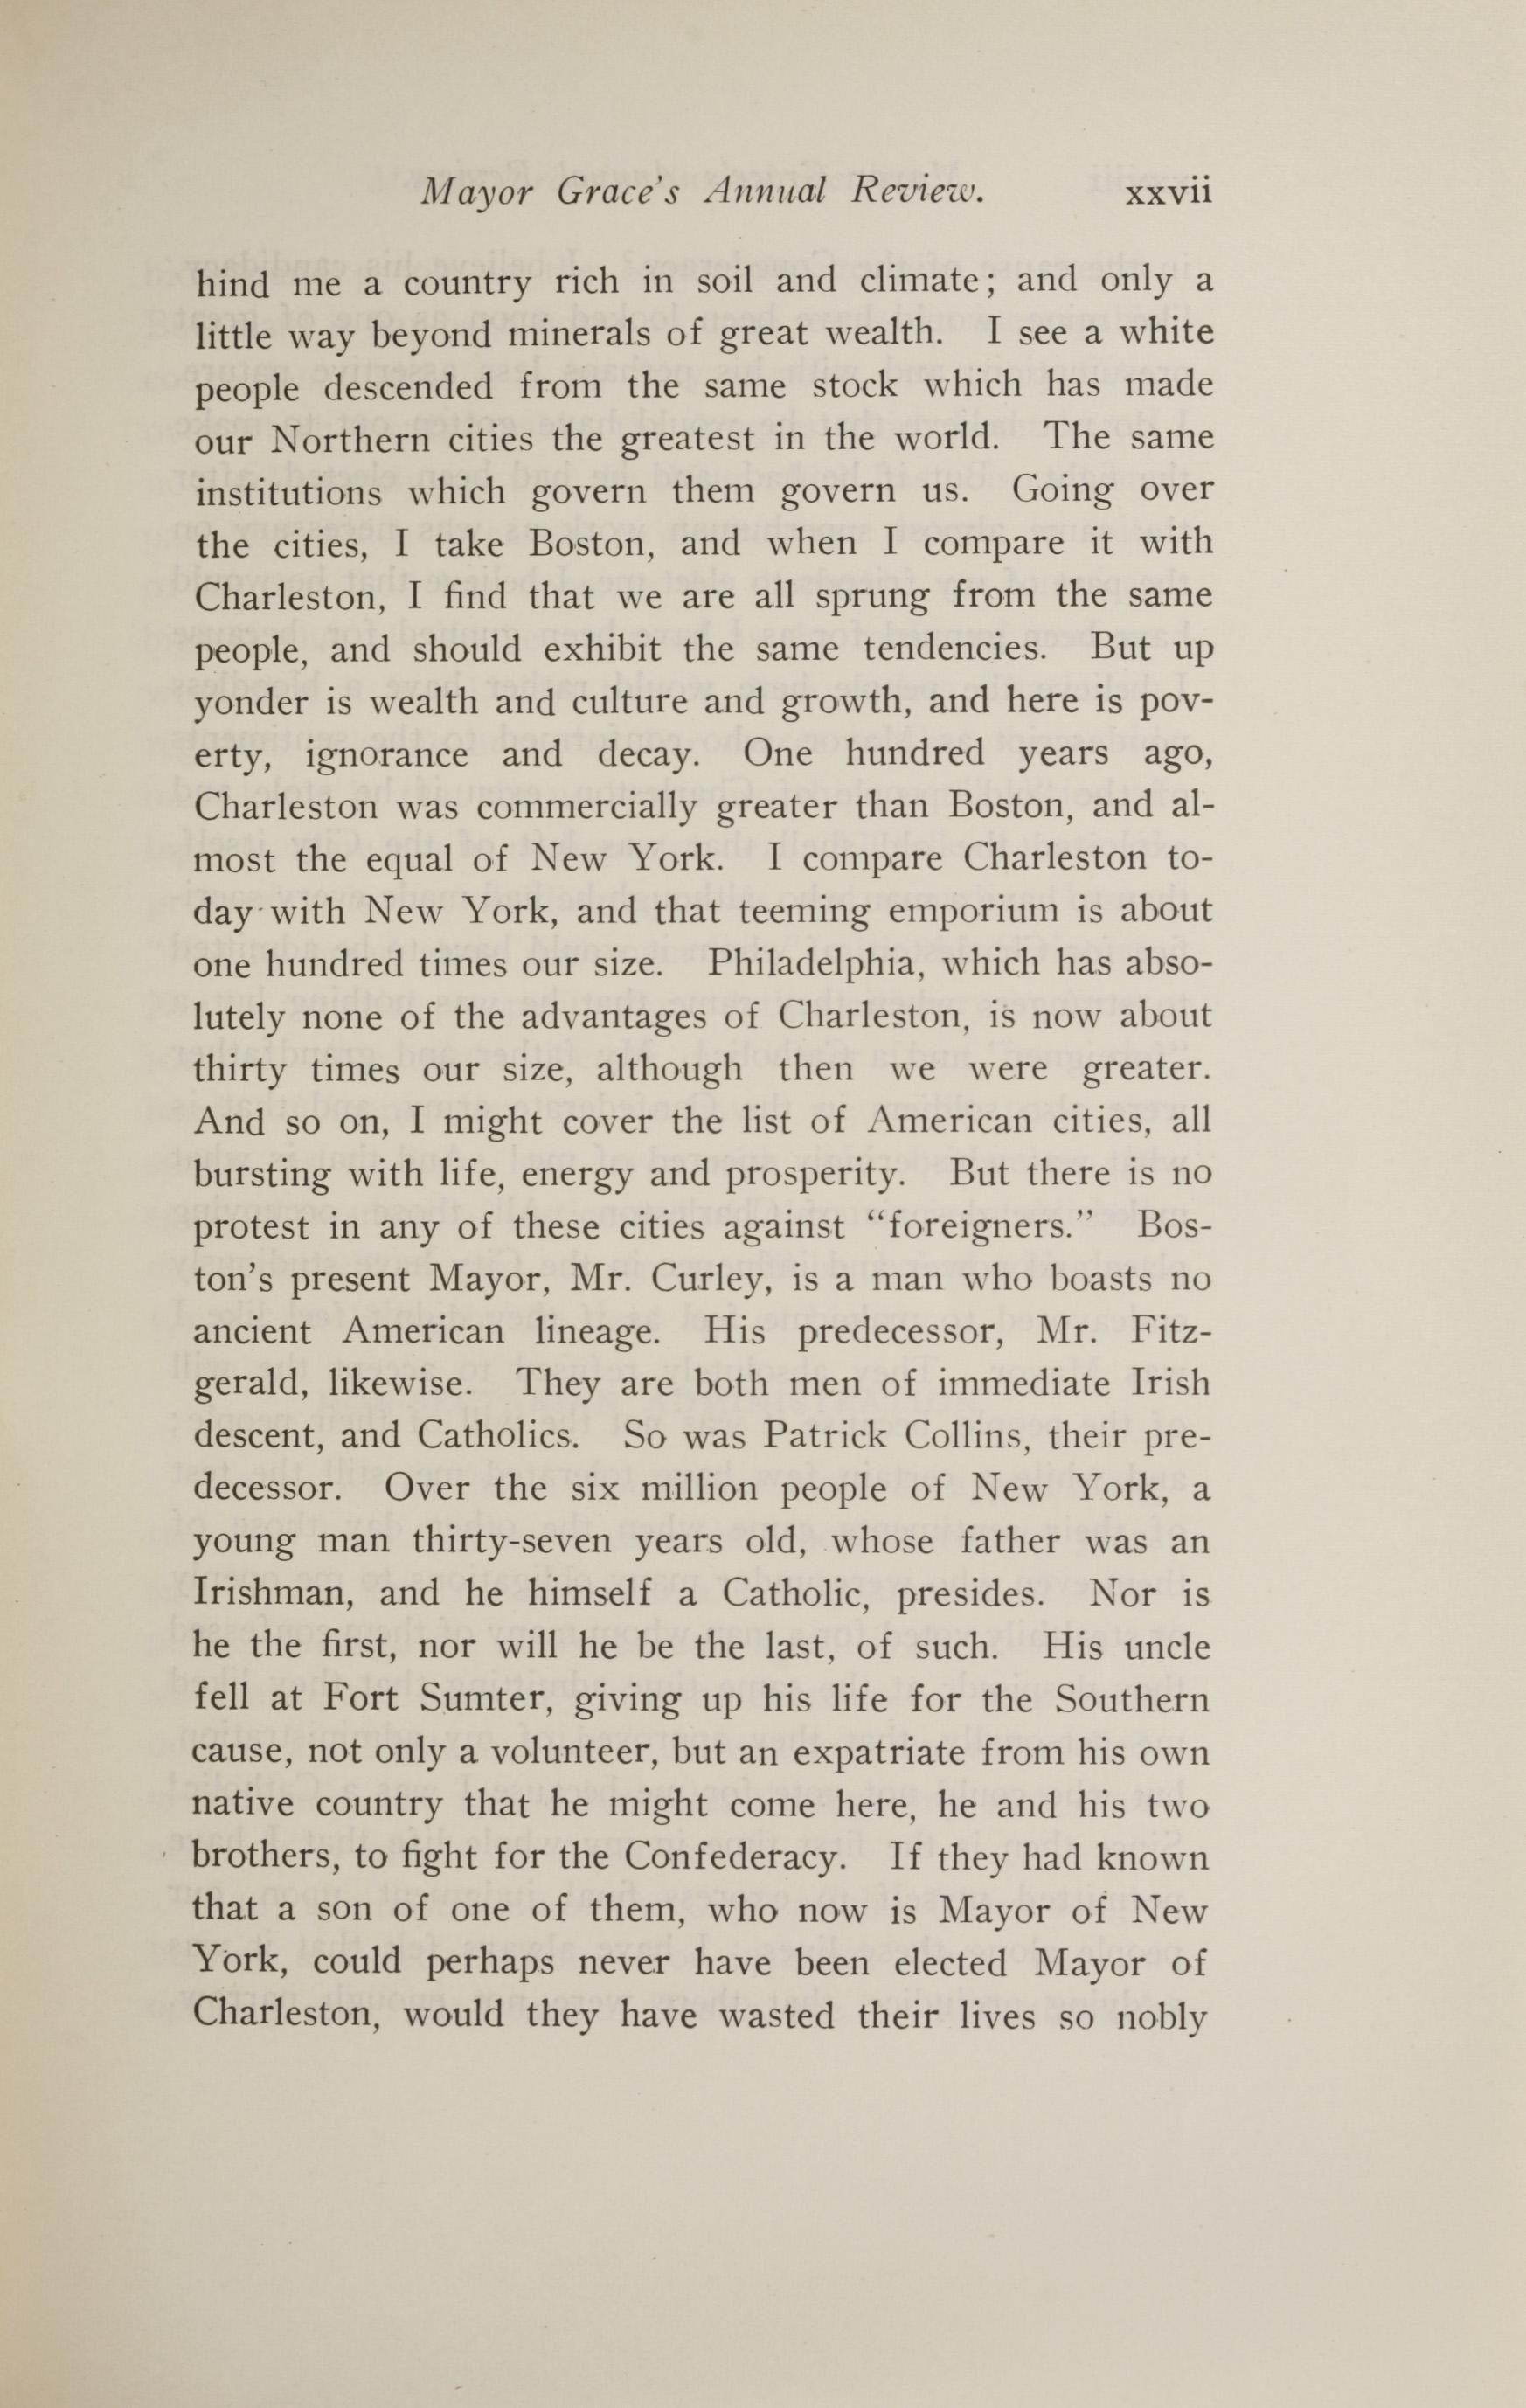 Charleston Yearbook, 1914, page xxvii